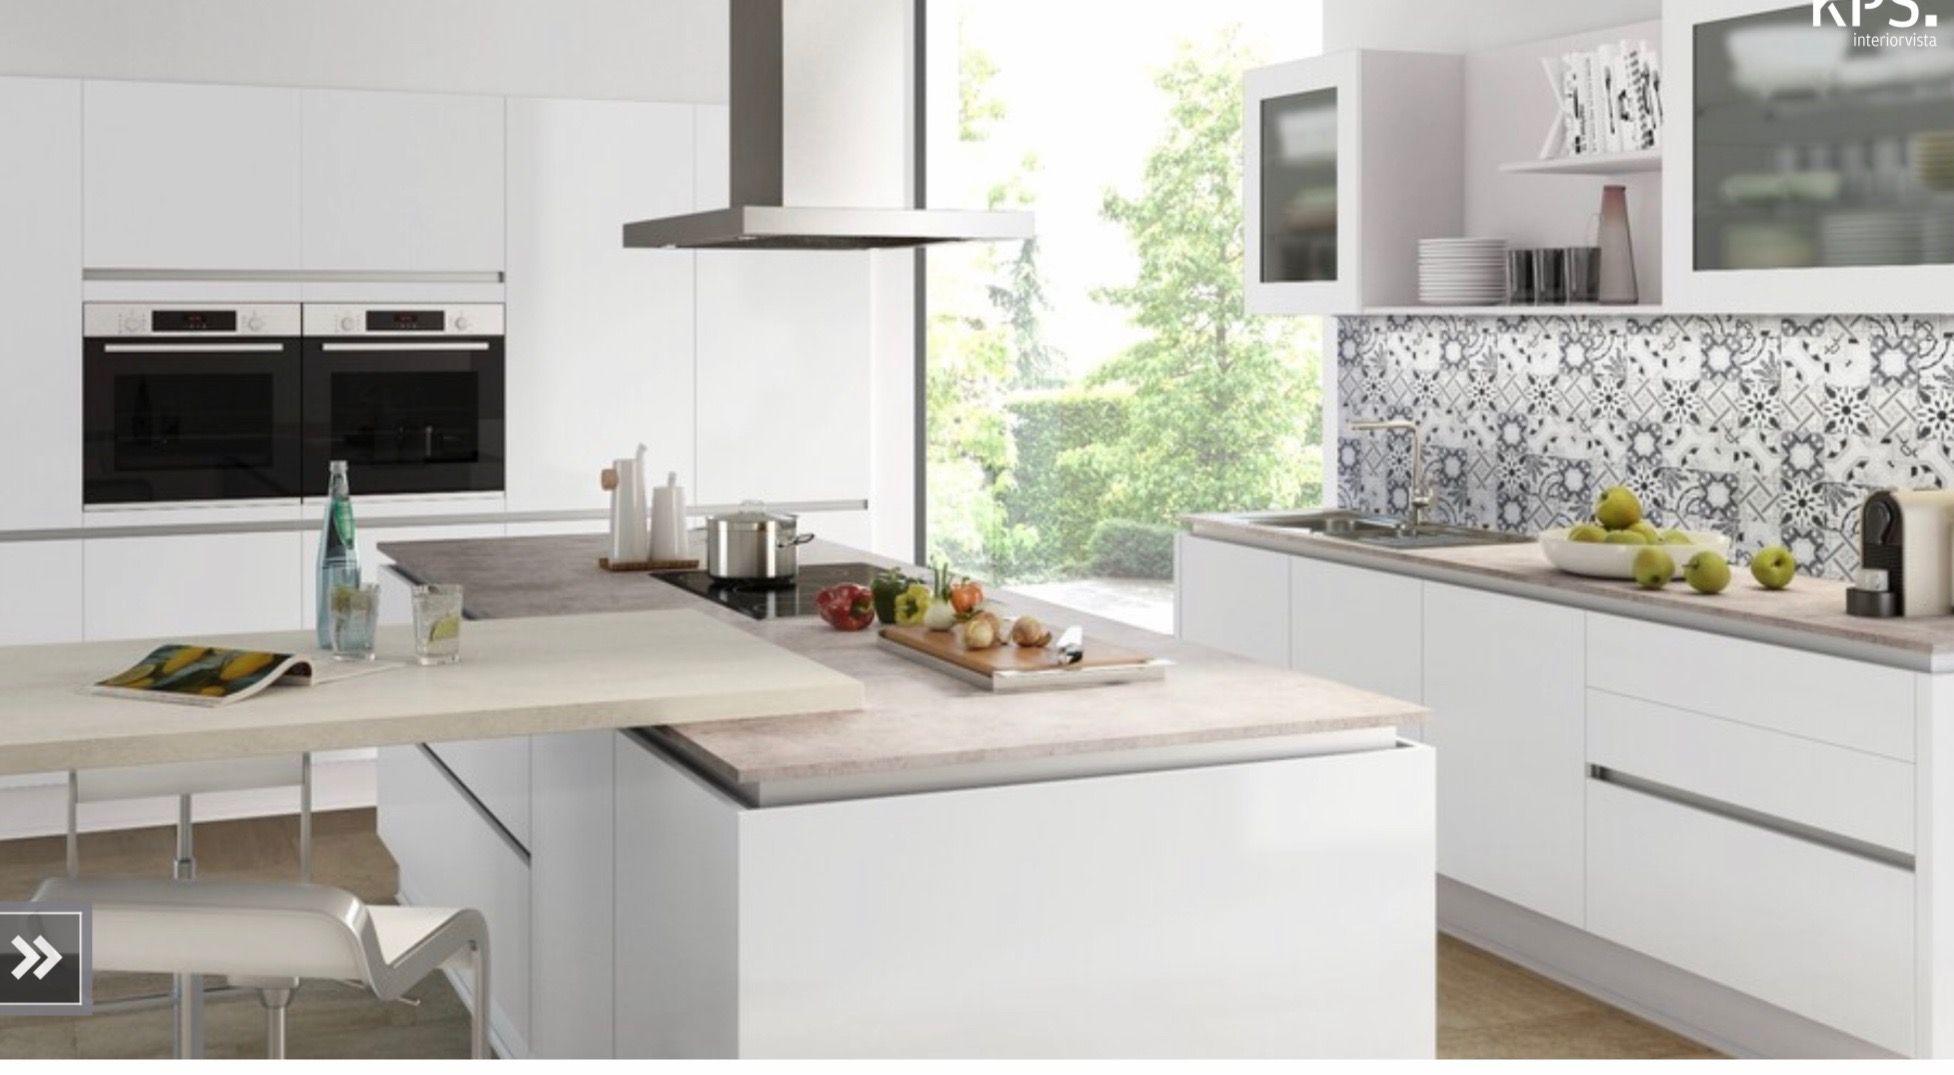 Pin von Mireia Miro auf Cocina  Nobilia, Nobilia küchen, Haus küchen